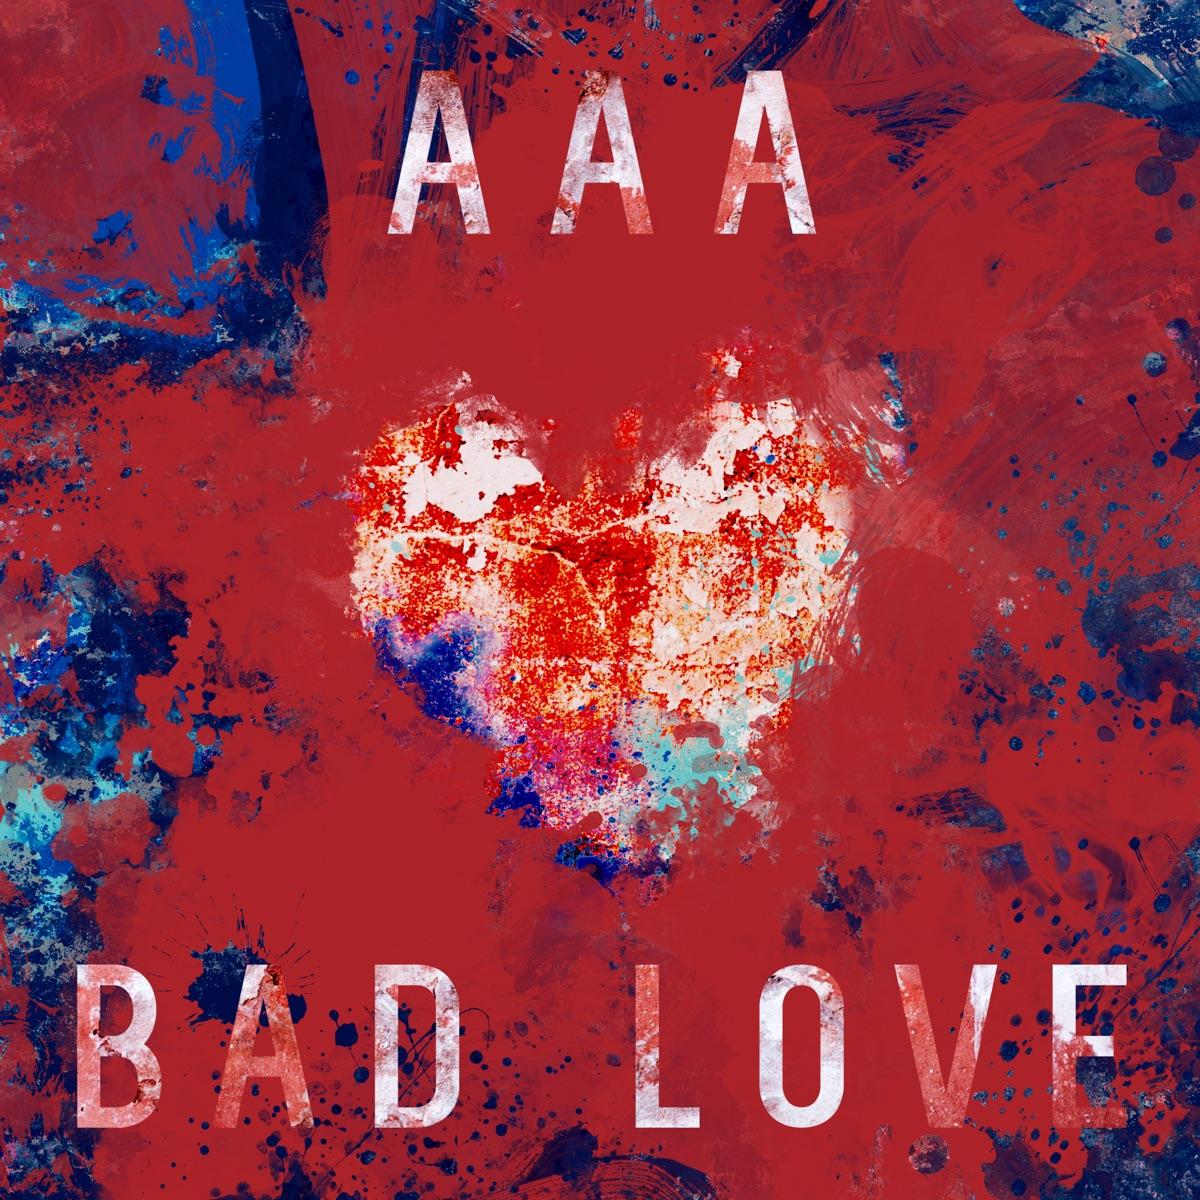 『AAA BAD LOVE 歌詞』収録の『BAD LOVE』ジャケット